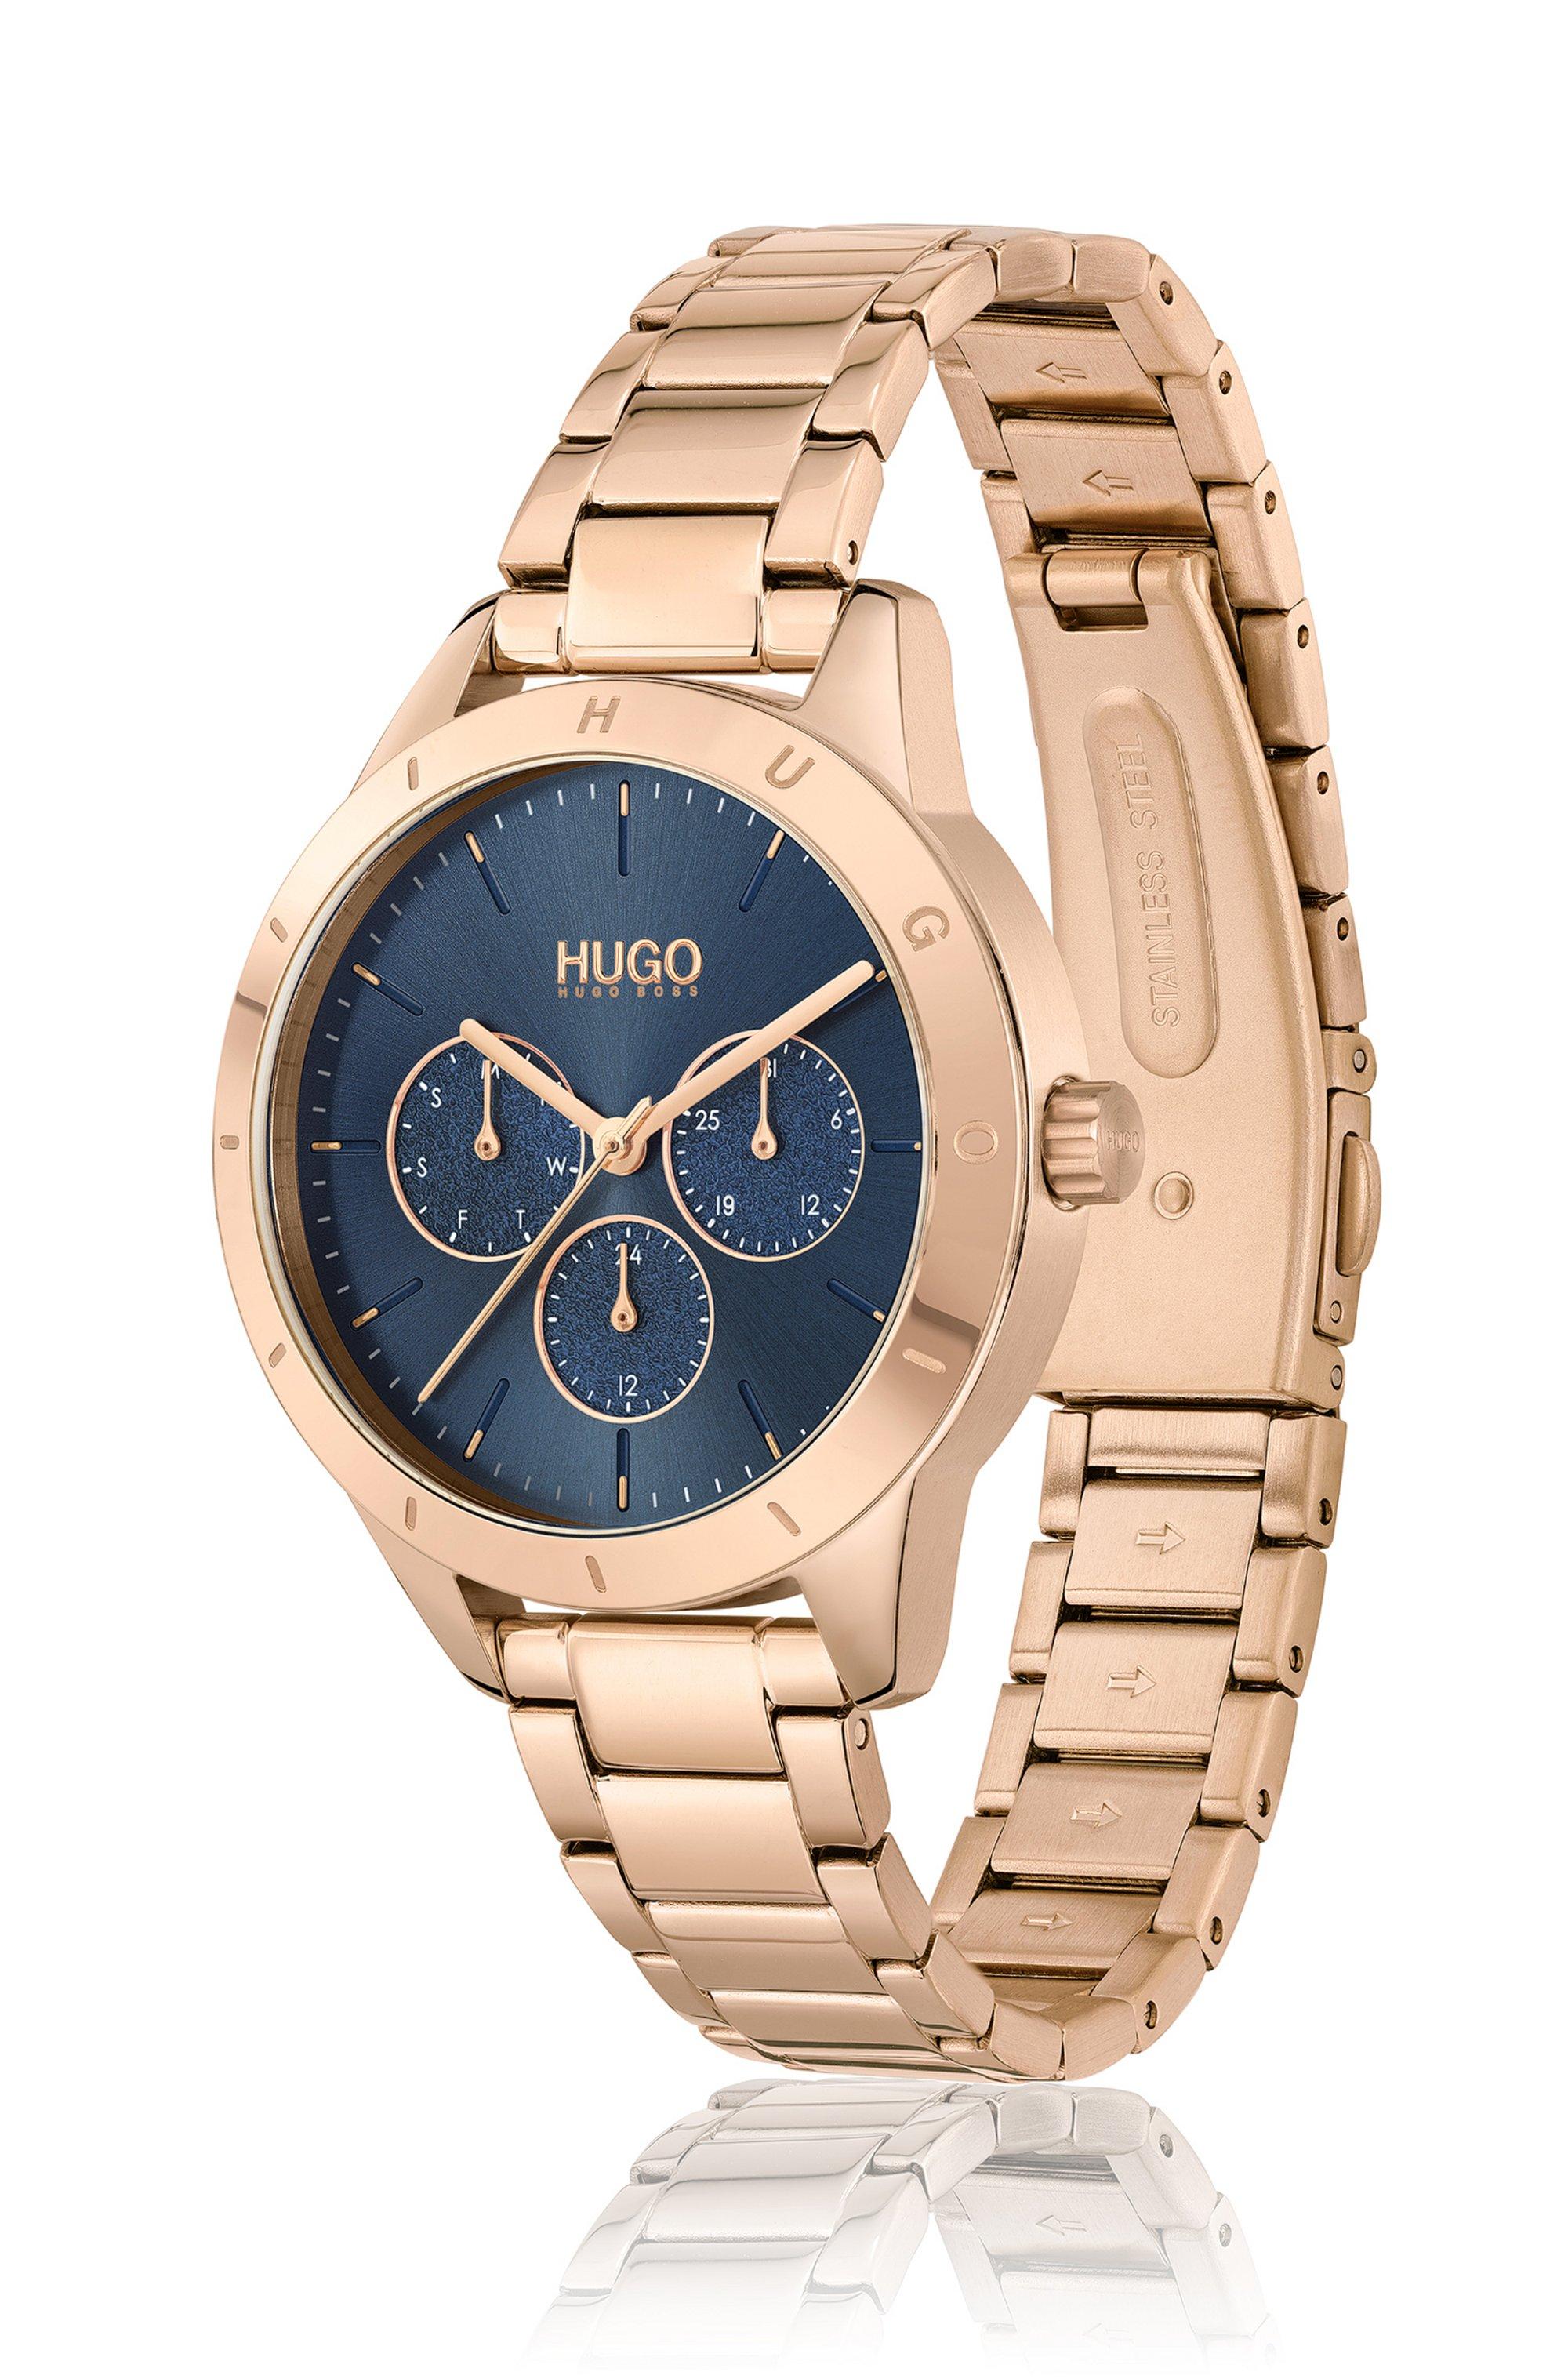 Carnation-gold-effect watch with logo bezel